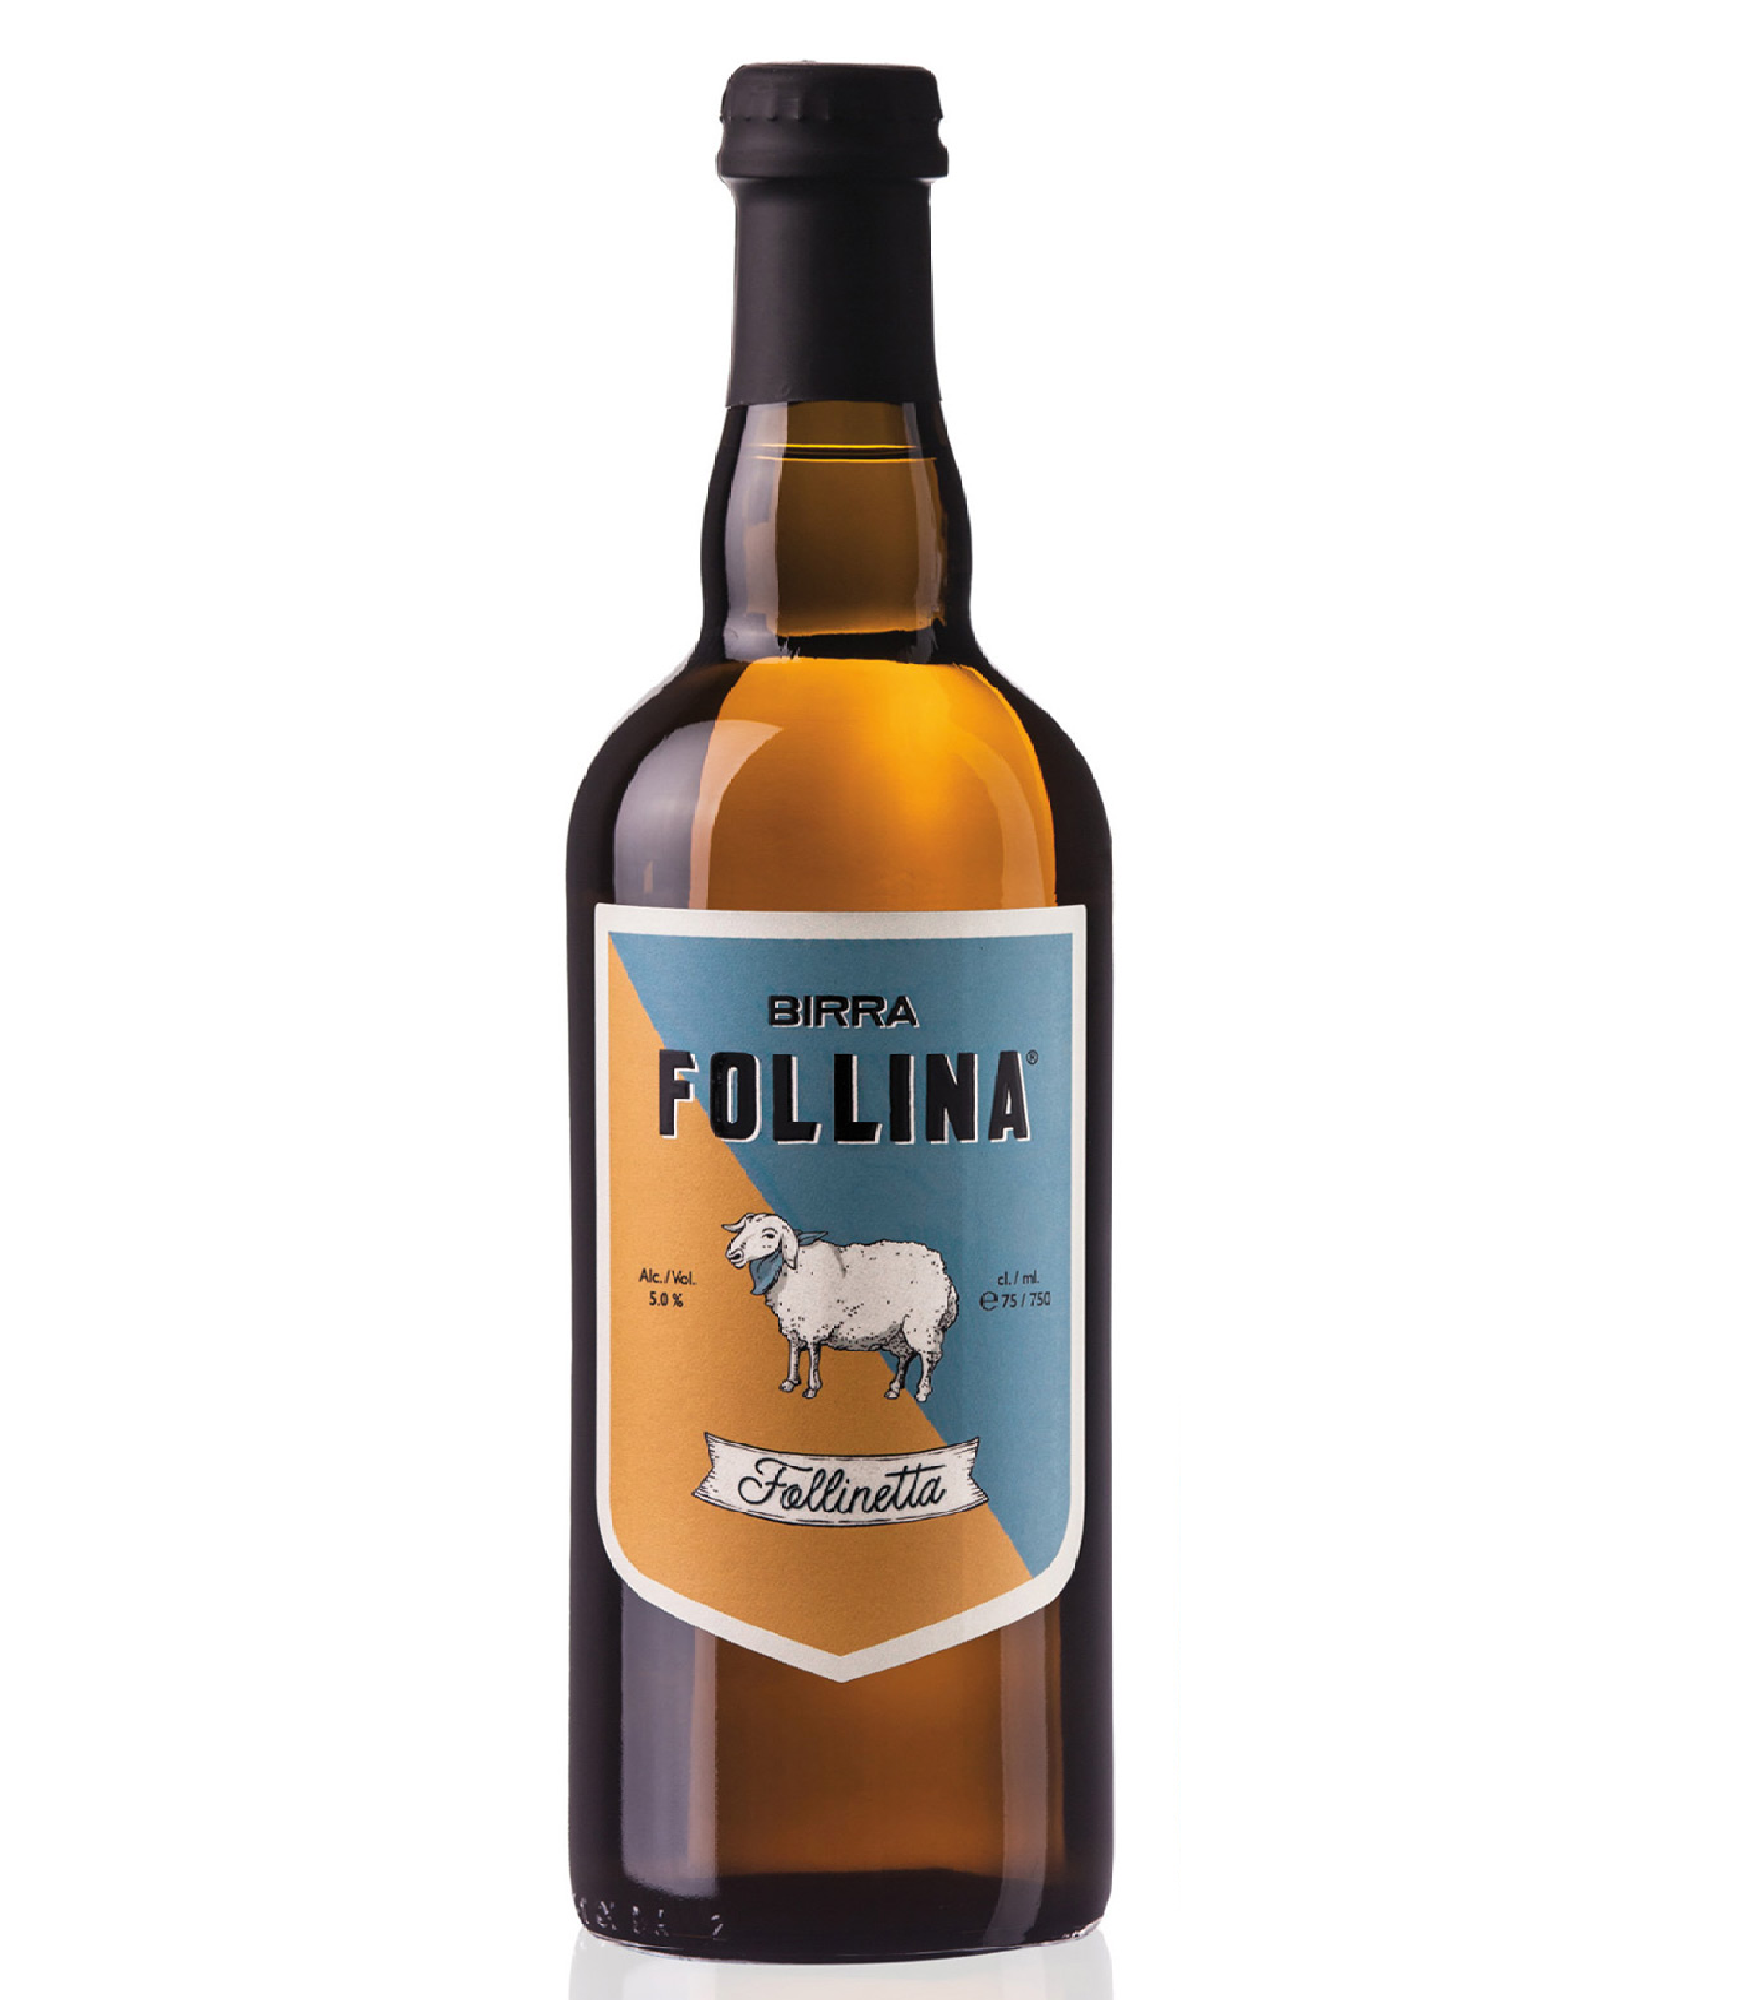 BIRRA FOLLINA FOLLINETTA cl75